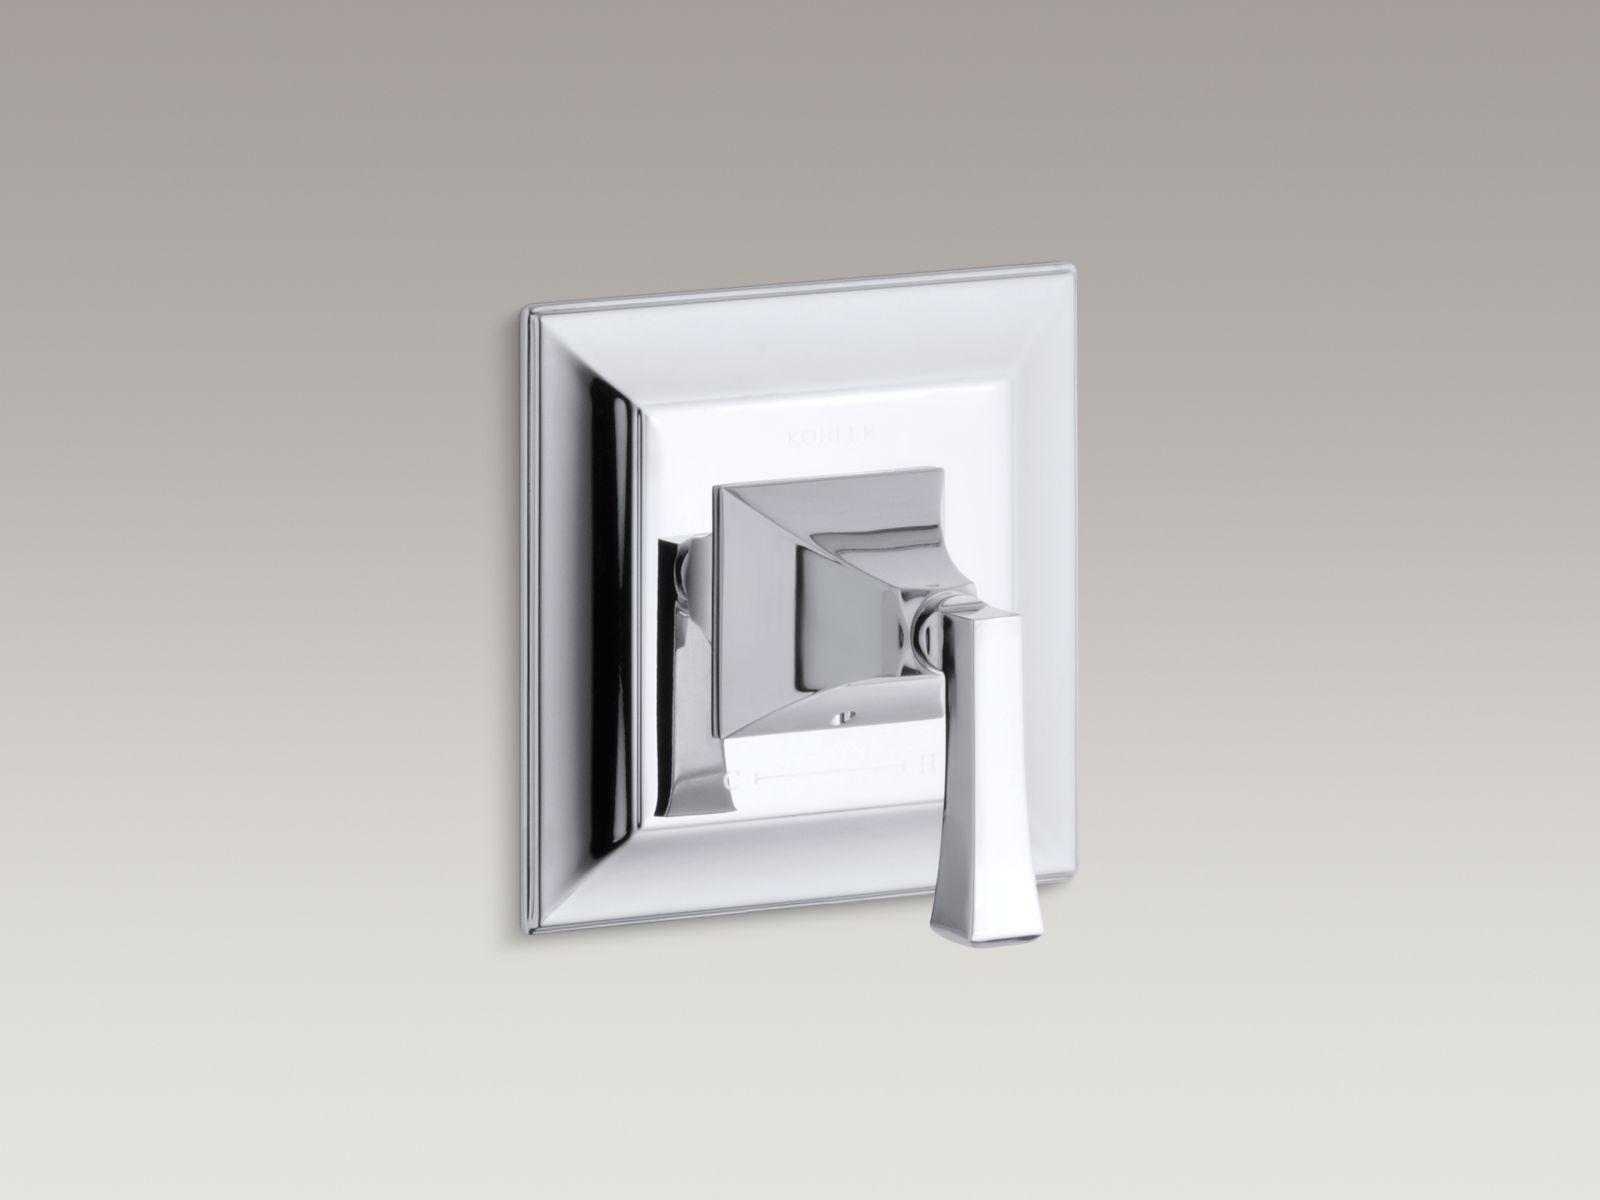 Ideas, kohler memoirs stately shower faucet kohler memoirs stately shower faucet buyplumbing category thermostatic shower 1600 x 1200  .